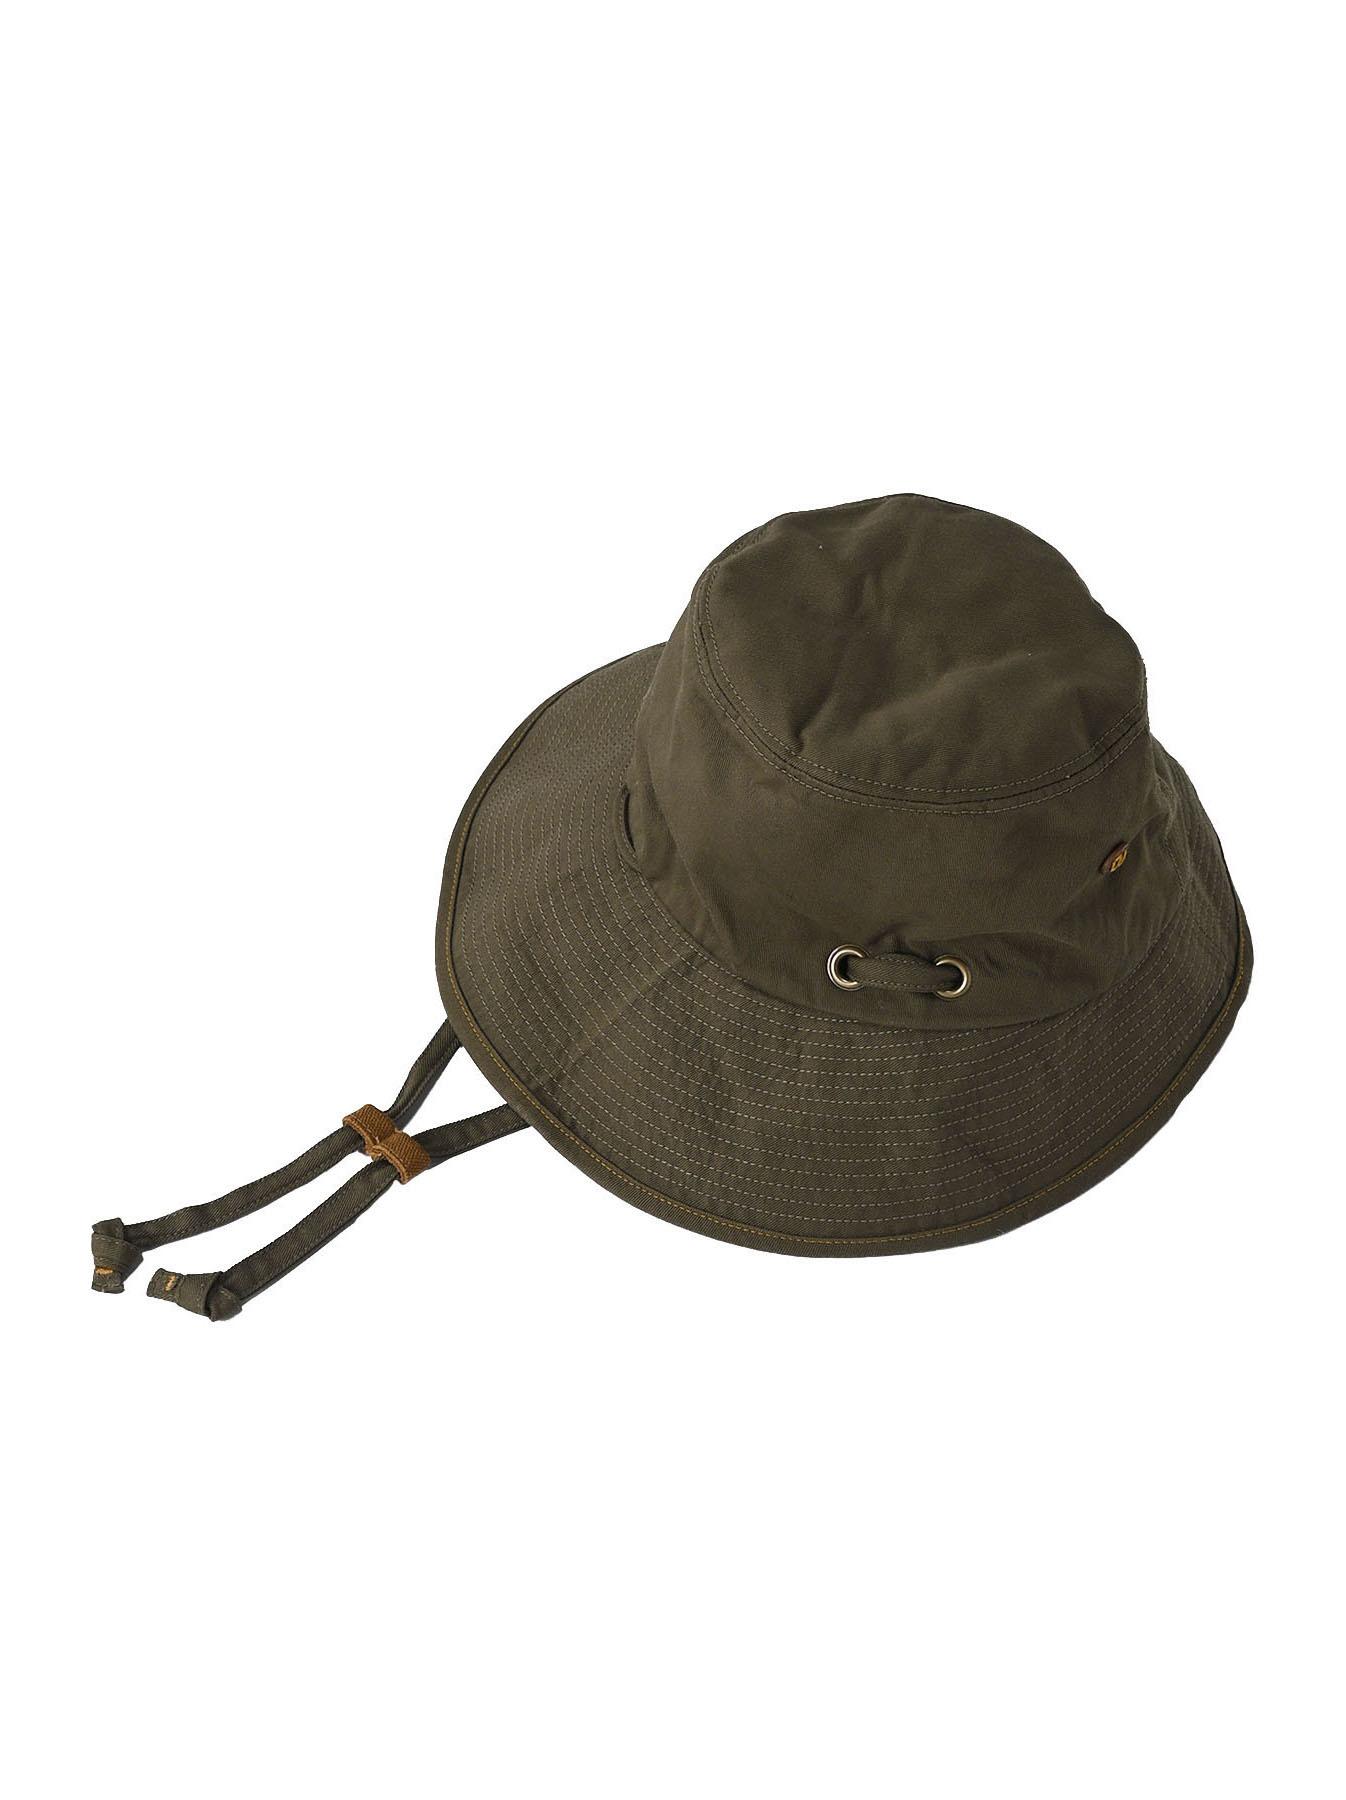 Okome Chino Sail Hat (0521)-1